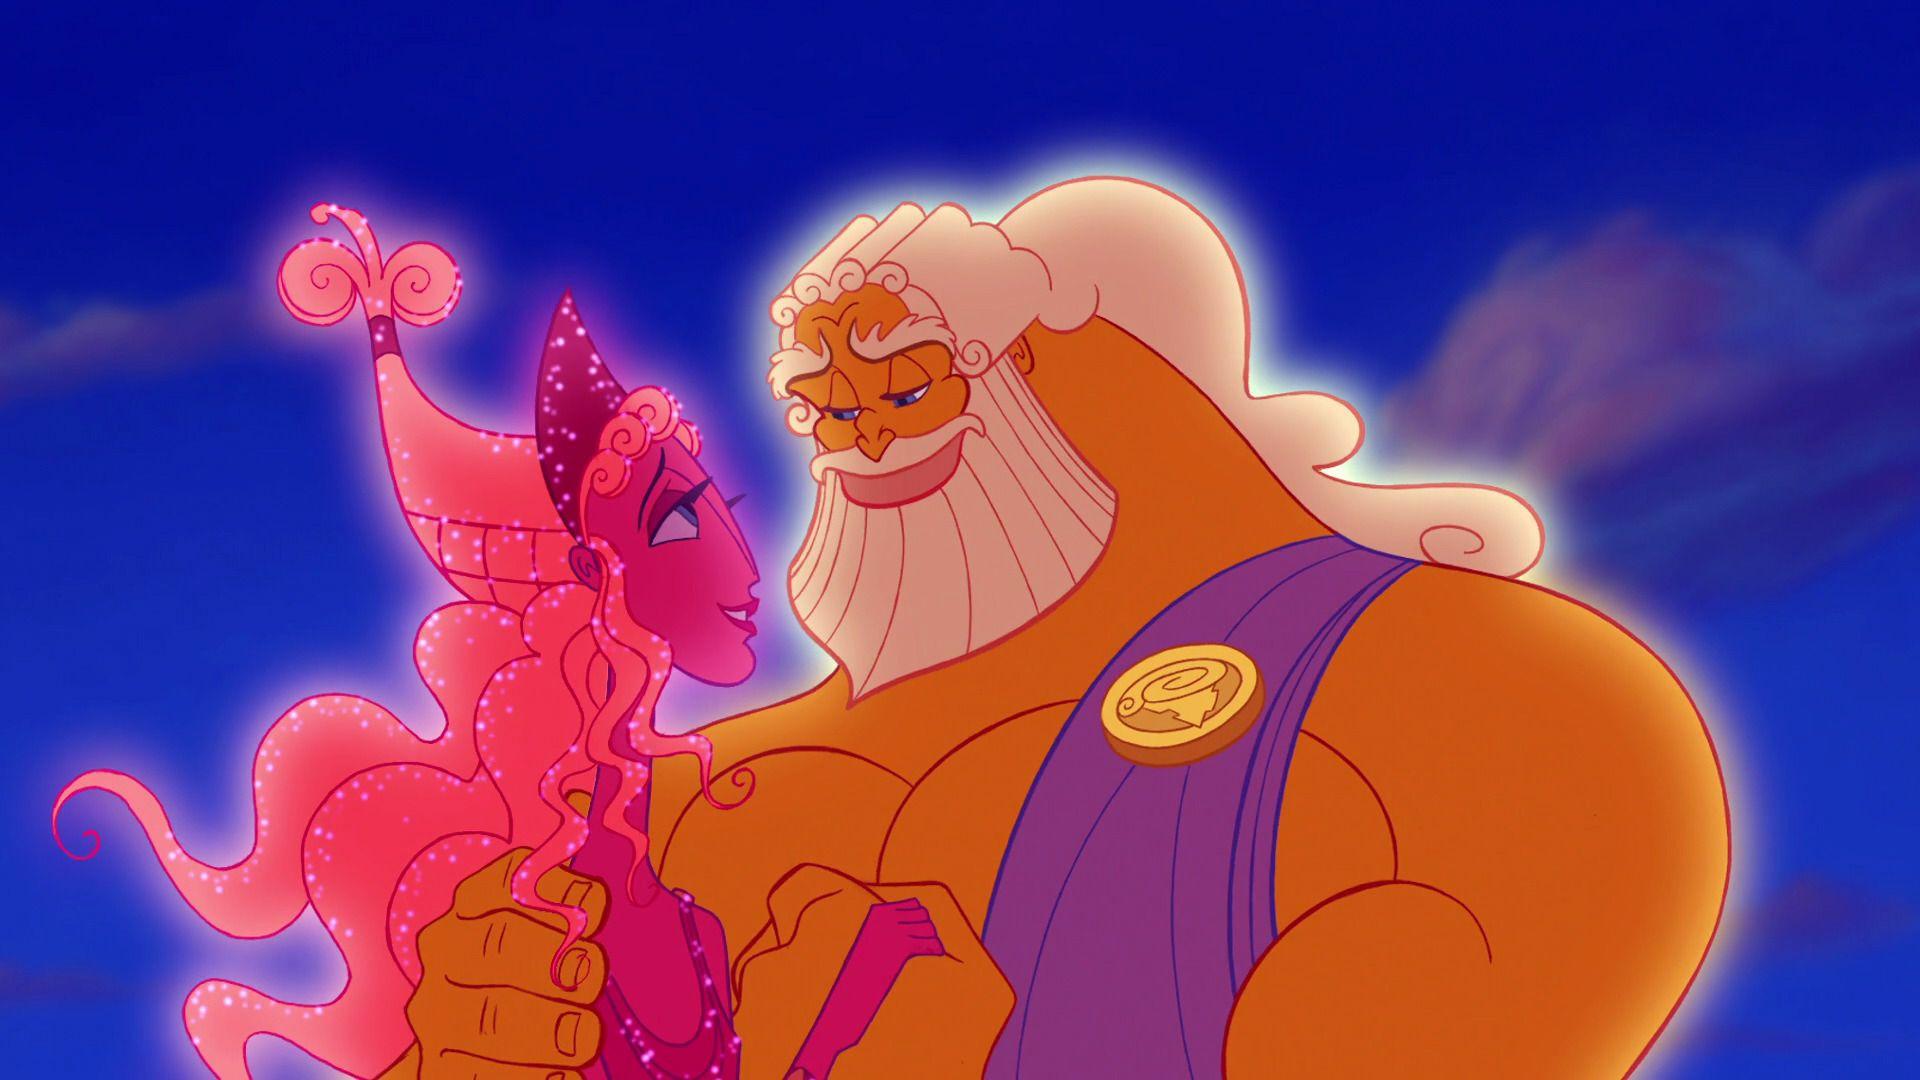 Zeus and Hera   Disney icons, Zeus and hera, Greek and roman mythology